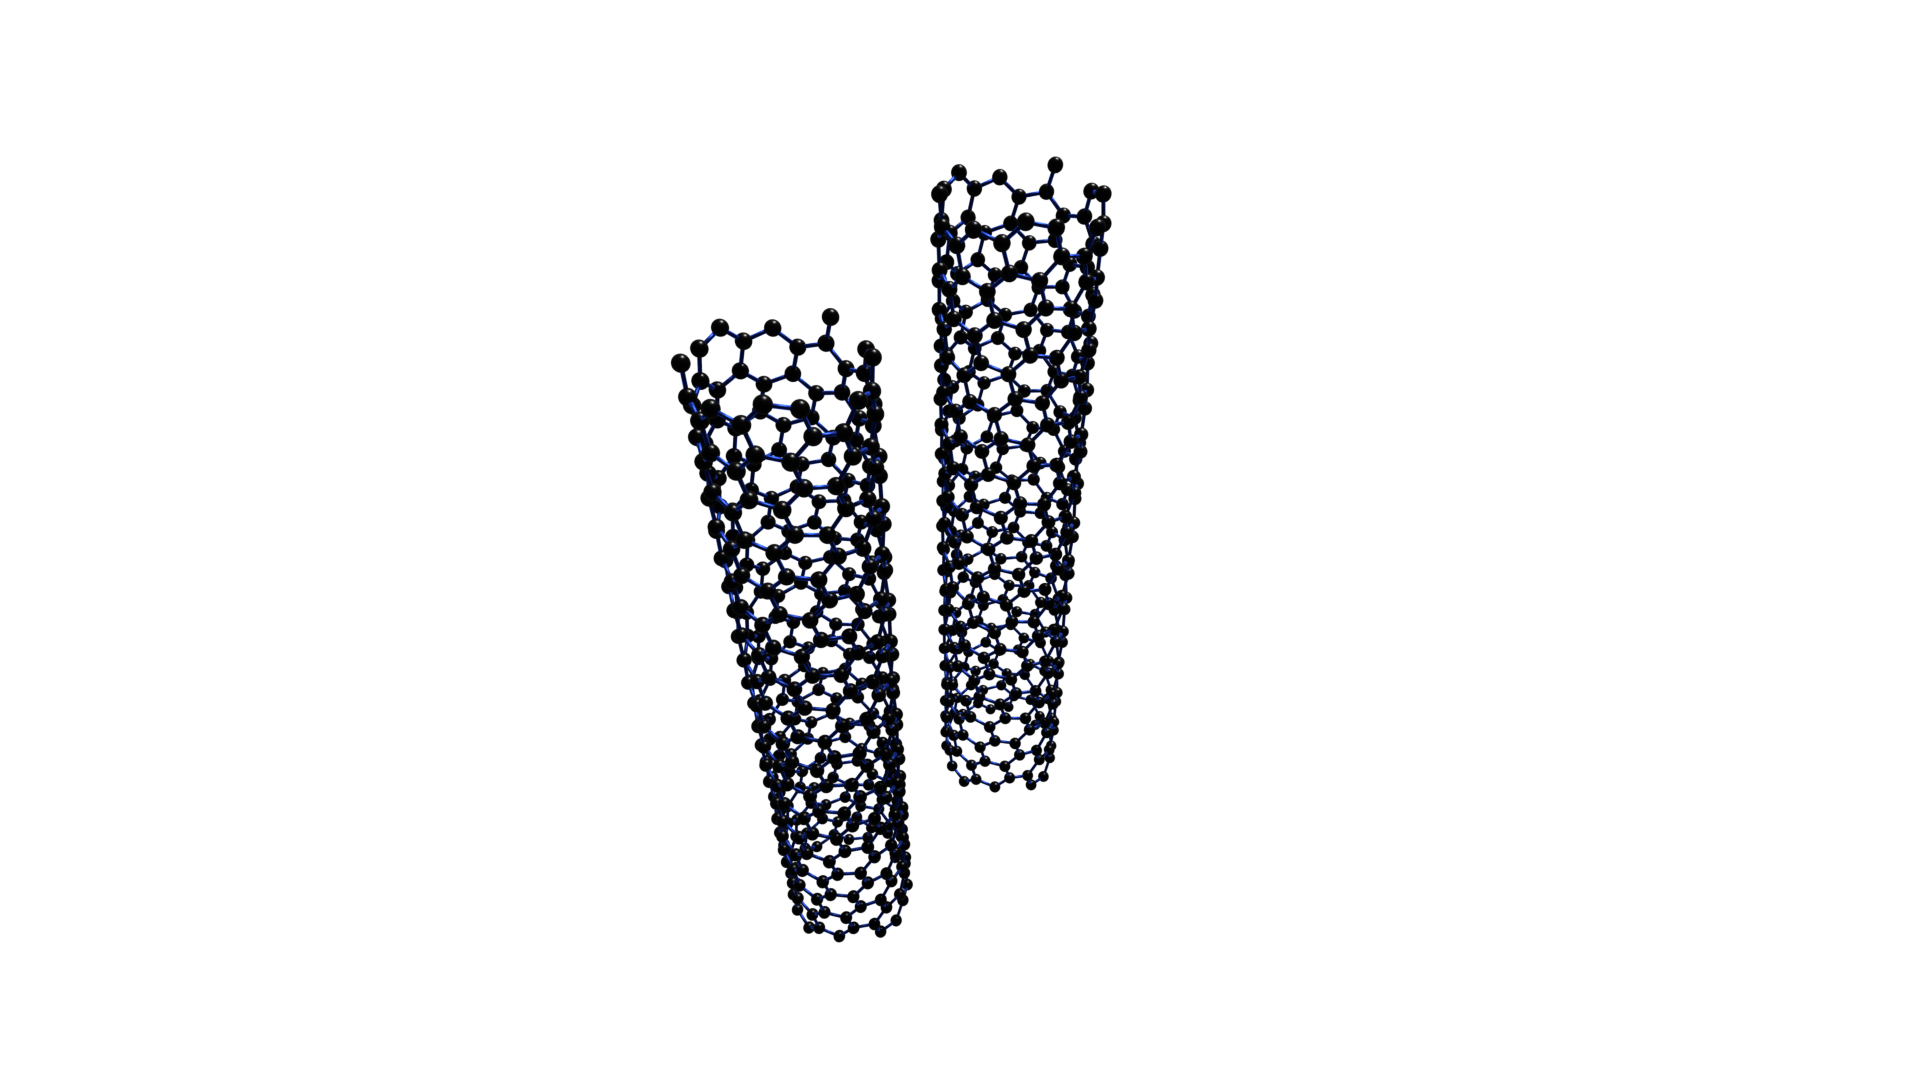 porous nanostructures